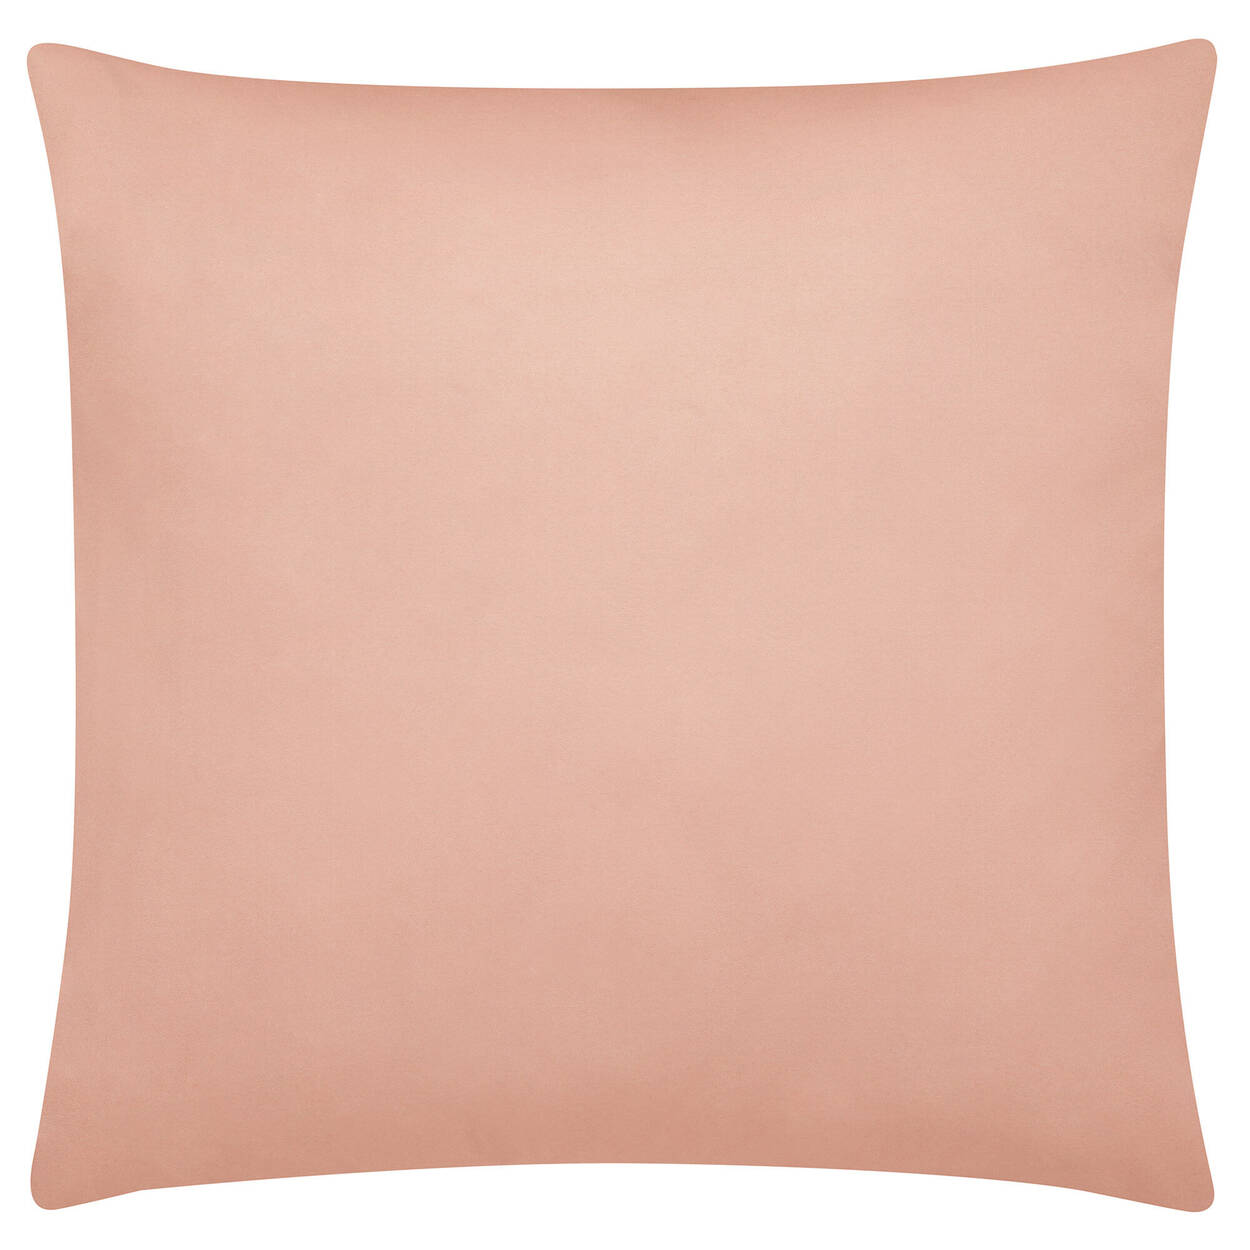 "Toucan Decorative Pillow Cover 18"" X 18"""